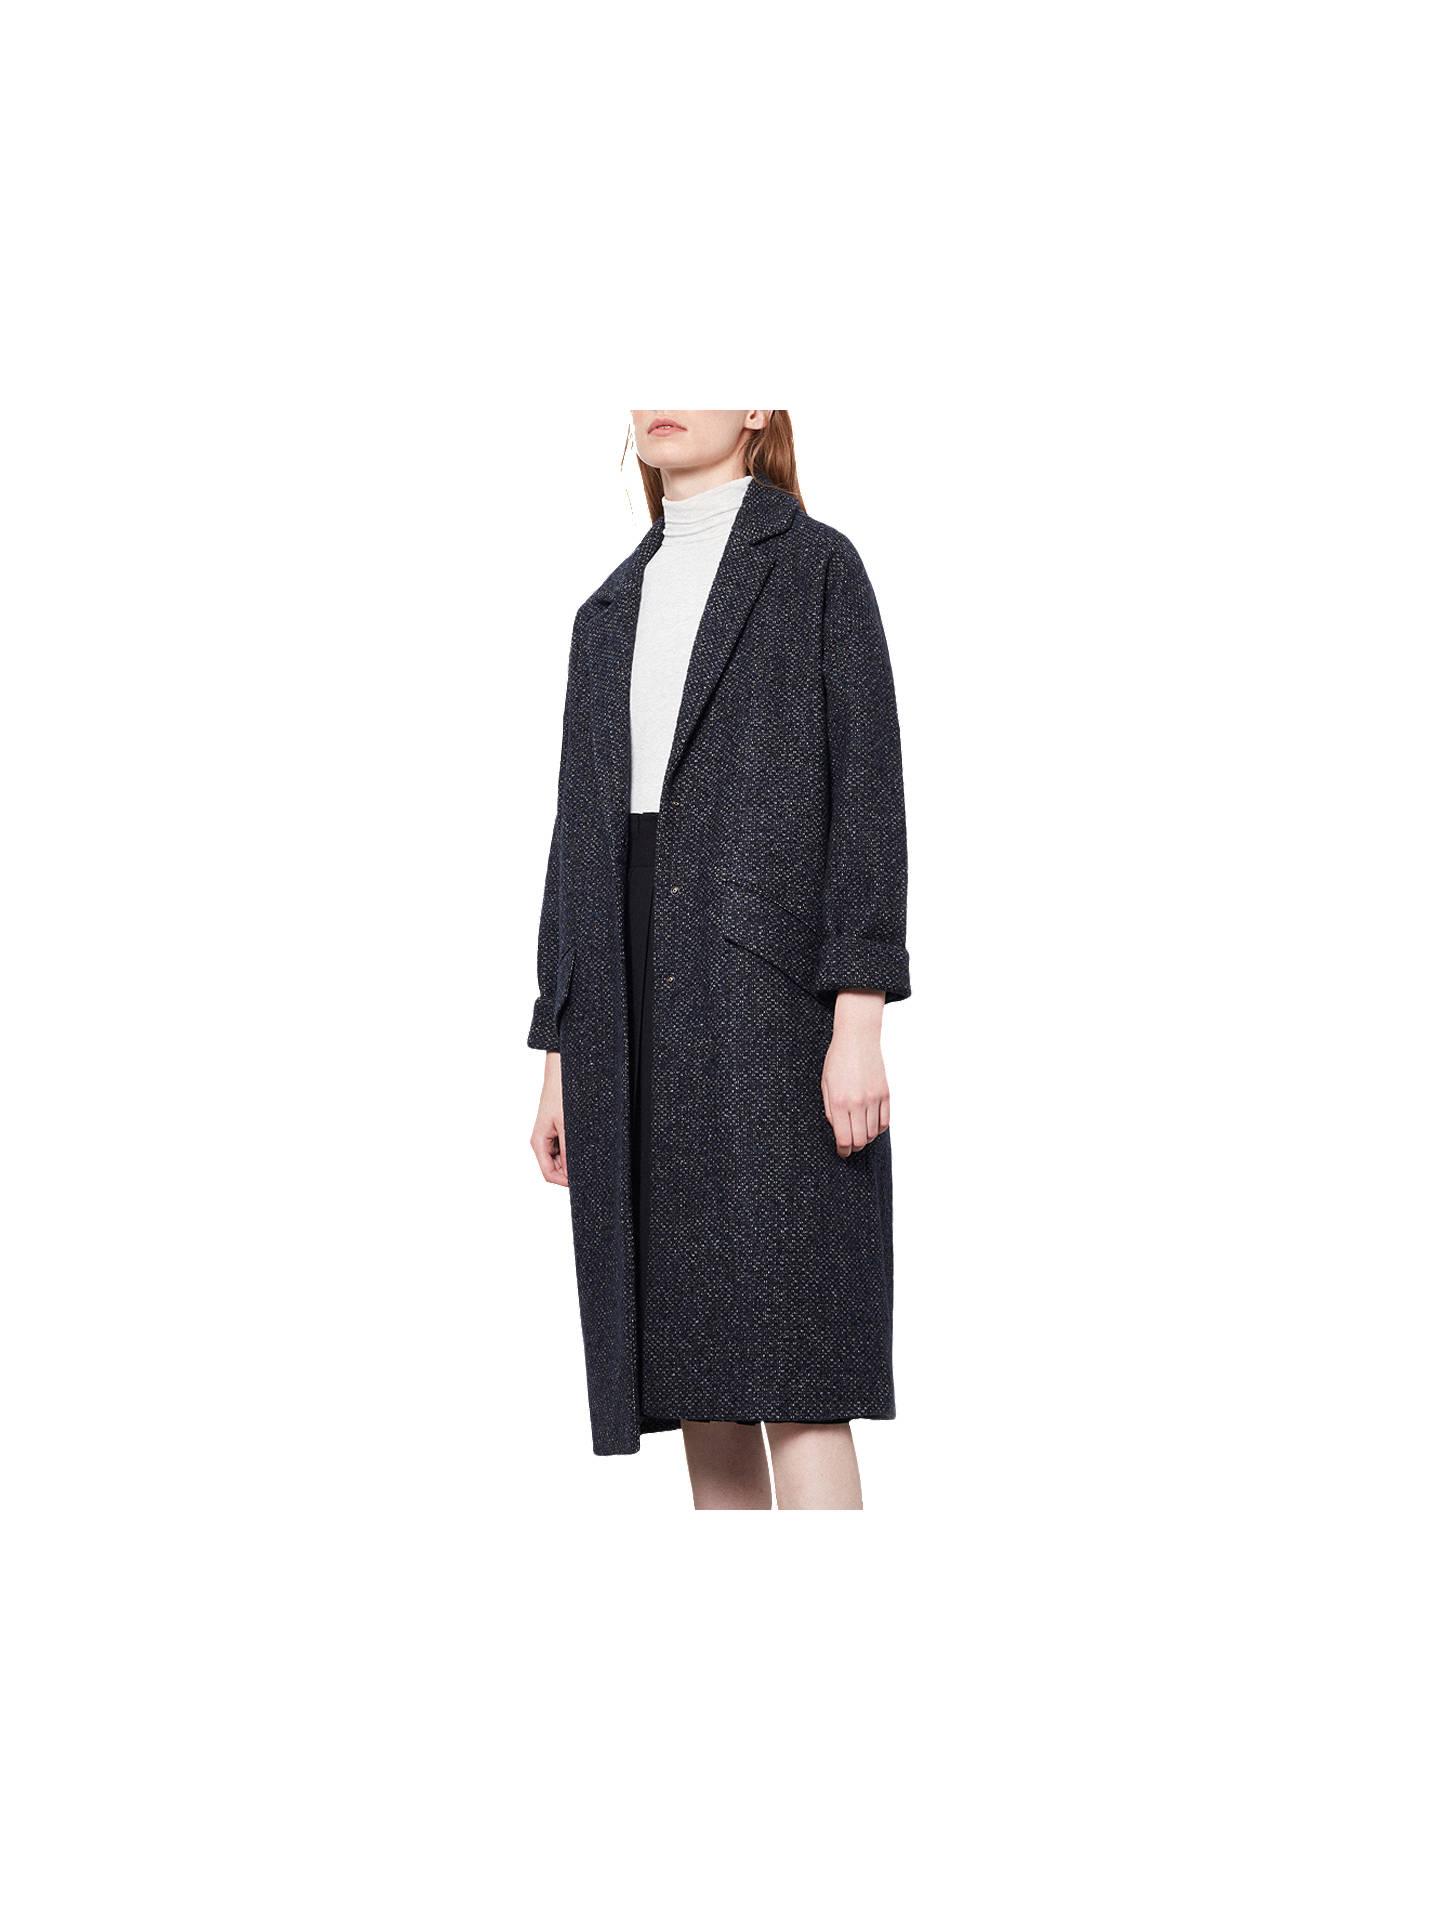 daf552dade6 Parka London Lola Duster Wool Coat, Navy at John Lewis & Partners